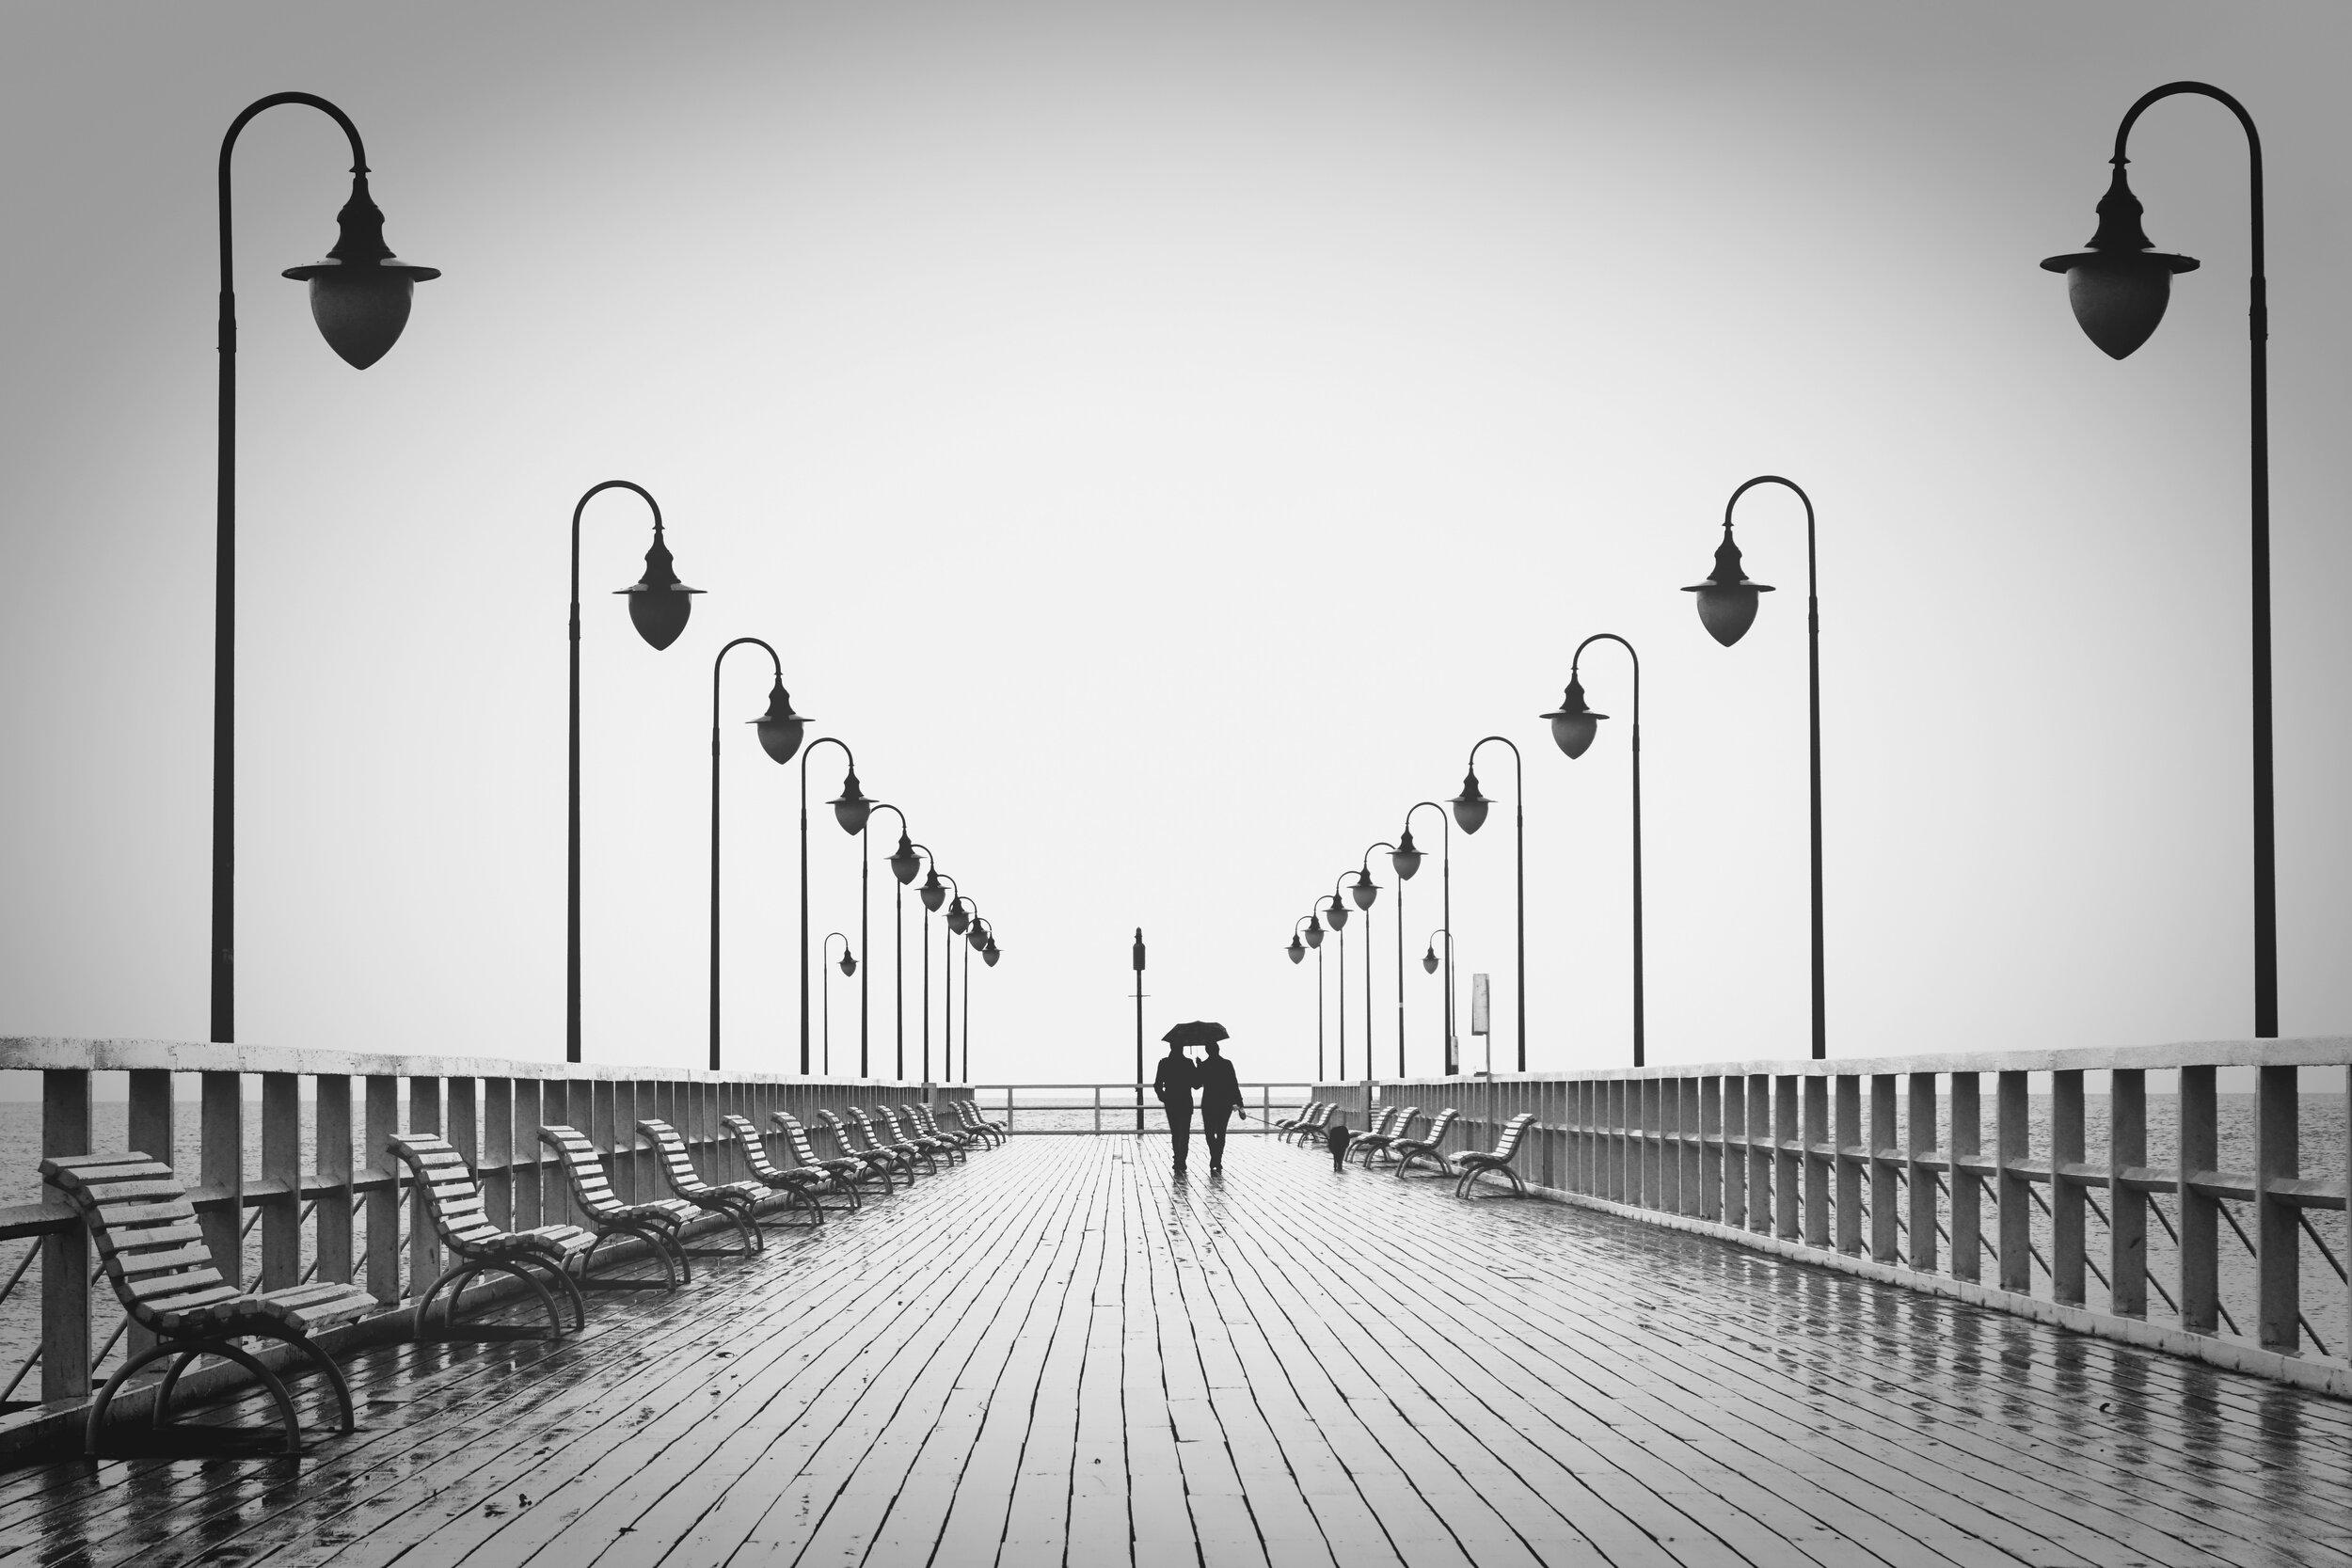 benches-black-and-white-boardwalk-220836.jpg